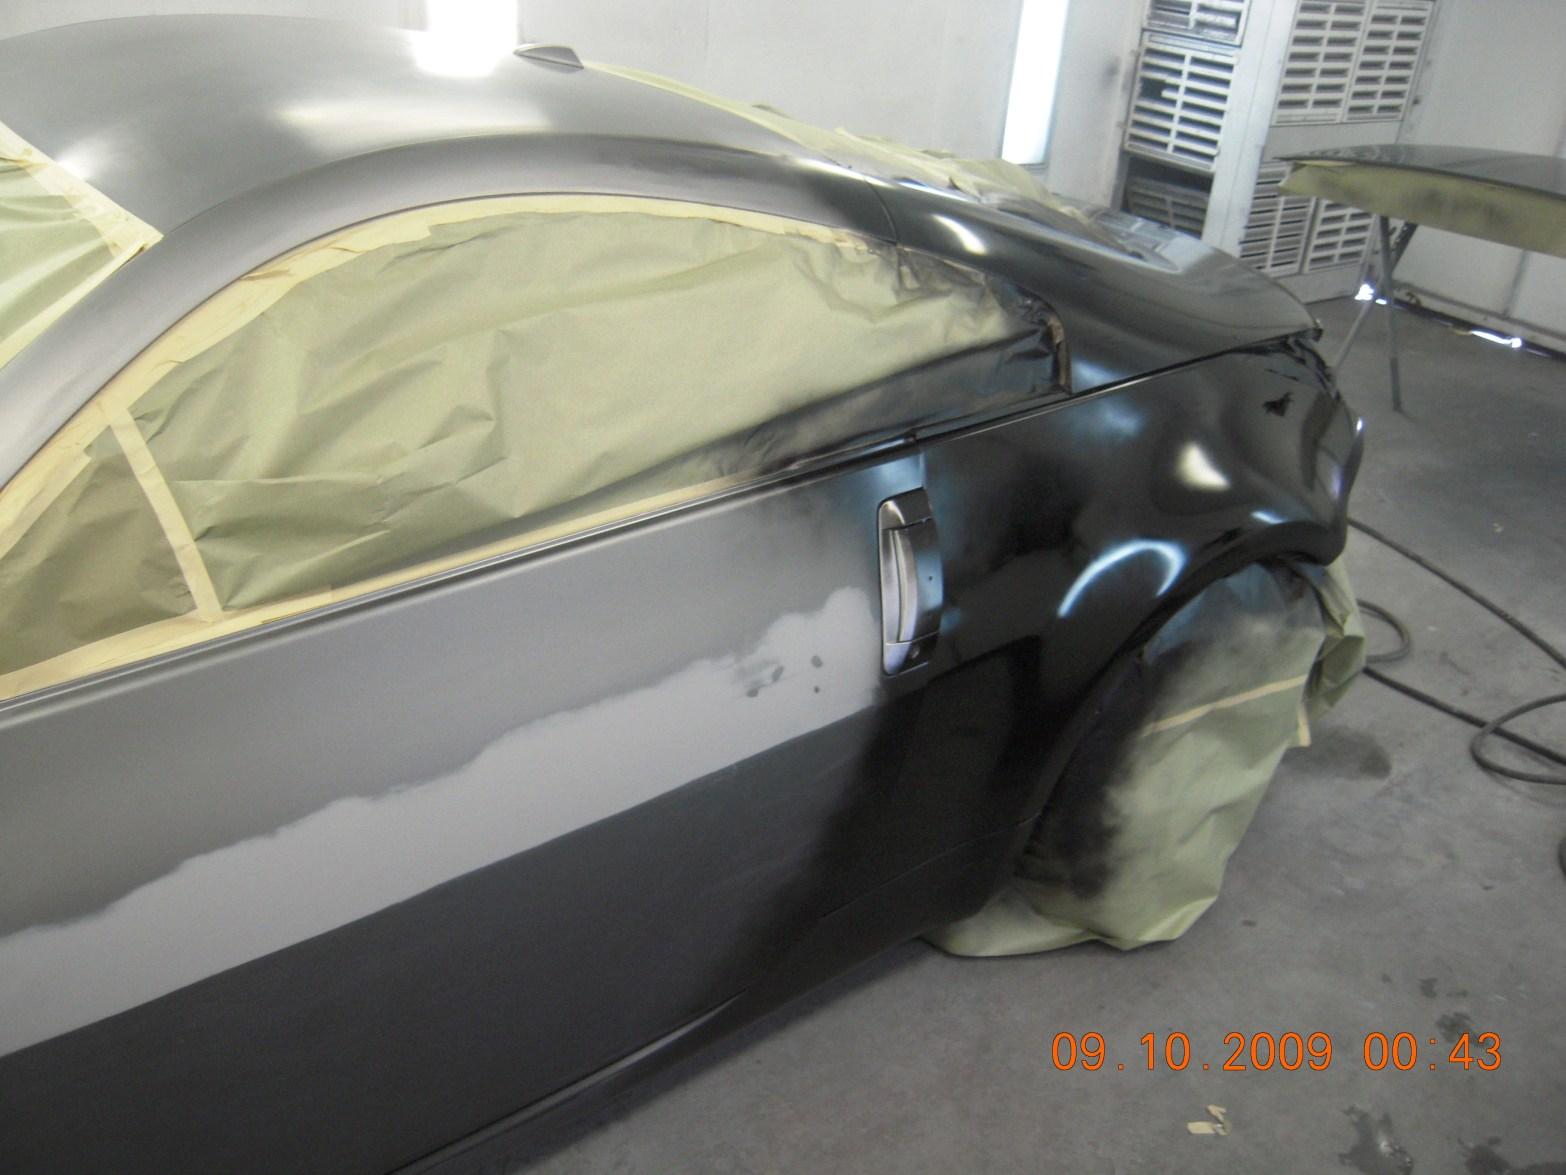 west-coast-body-and-paint-flat-black-nissan-350z-8